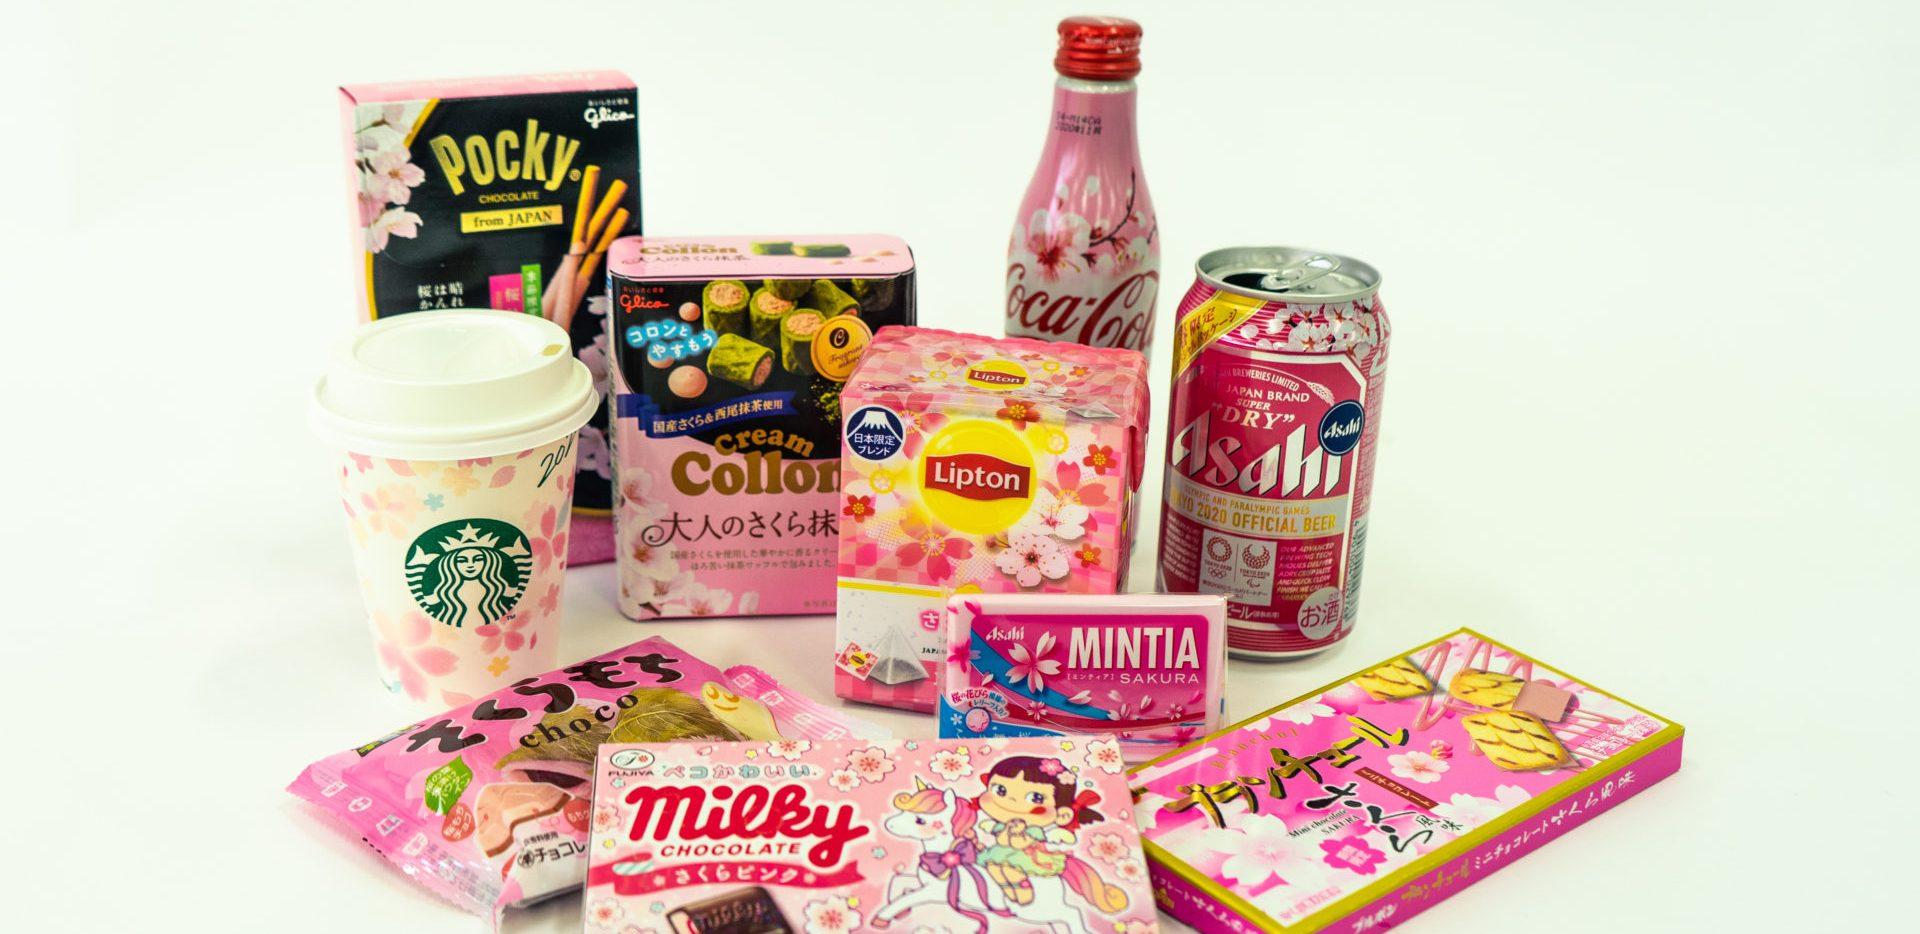 Les boissons et la nourriture goût Sakura en 2020